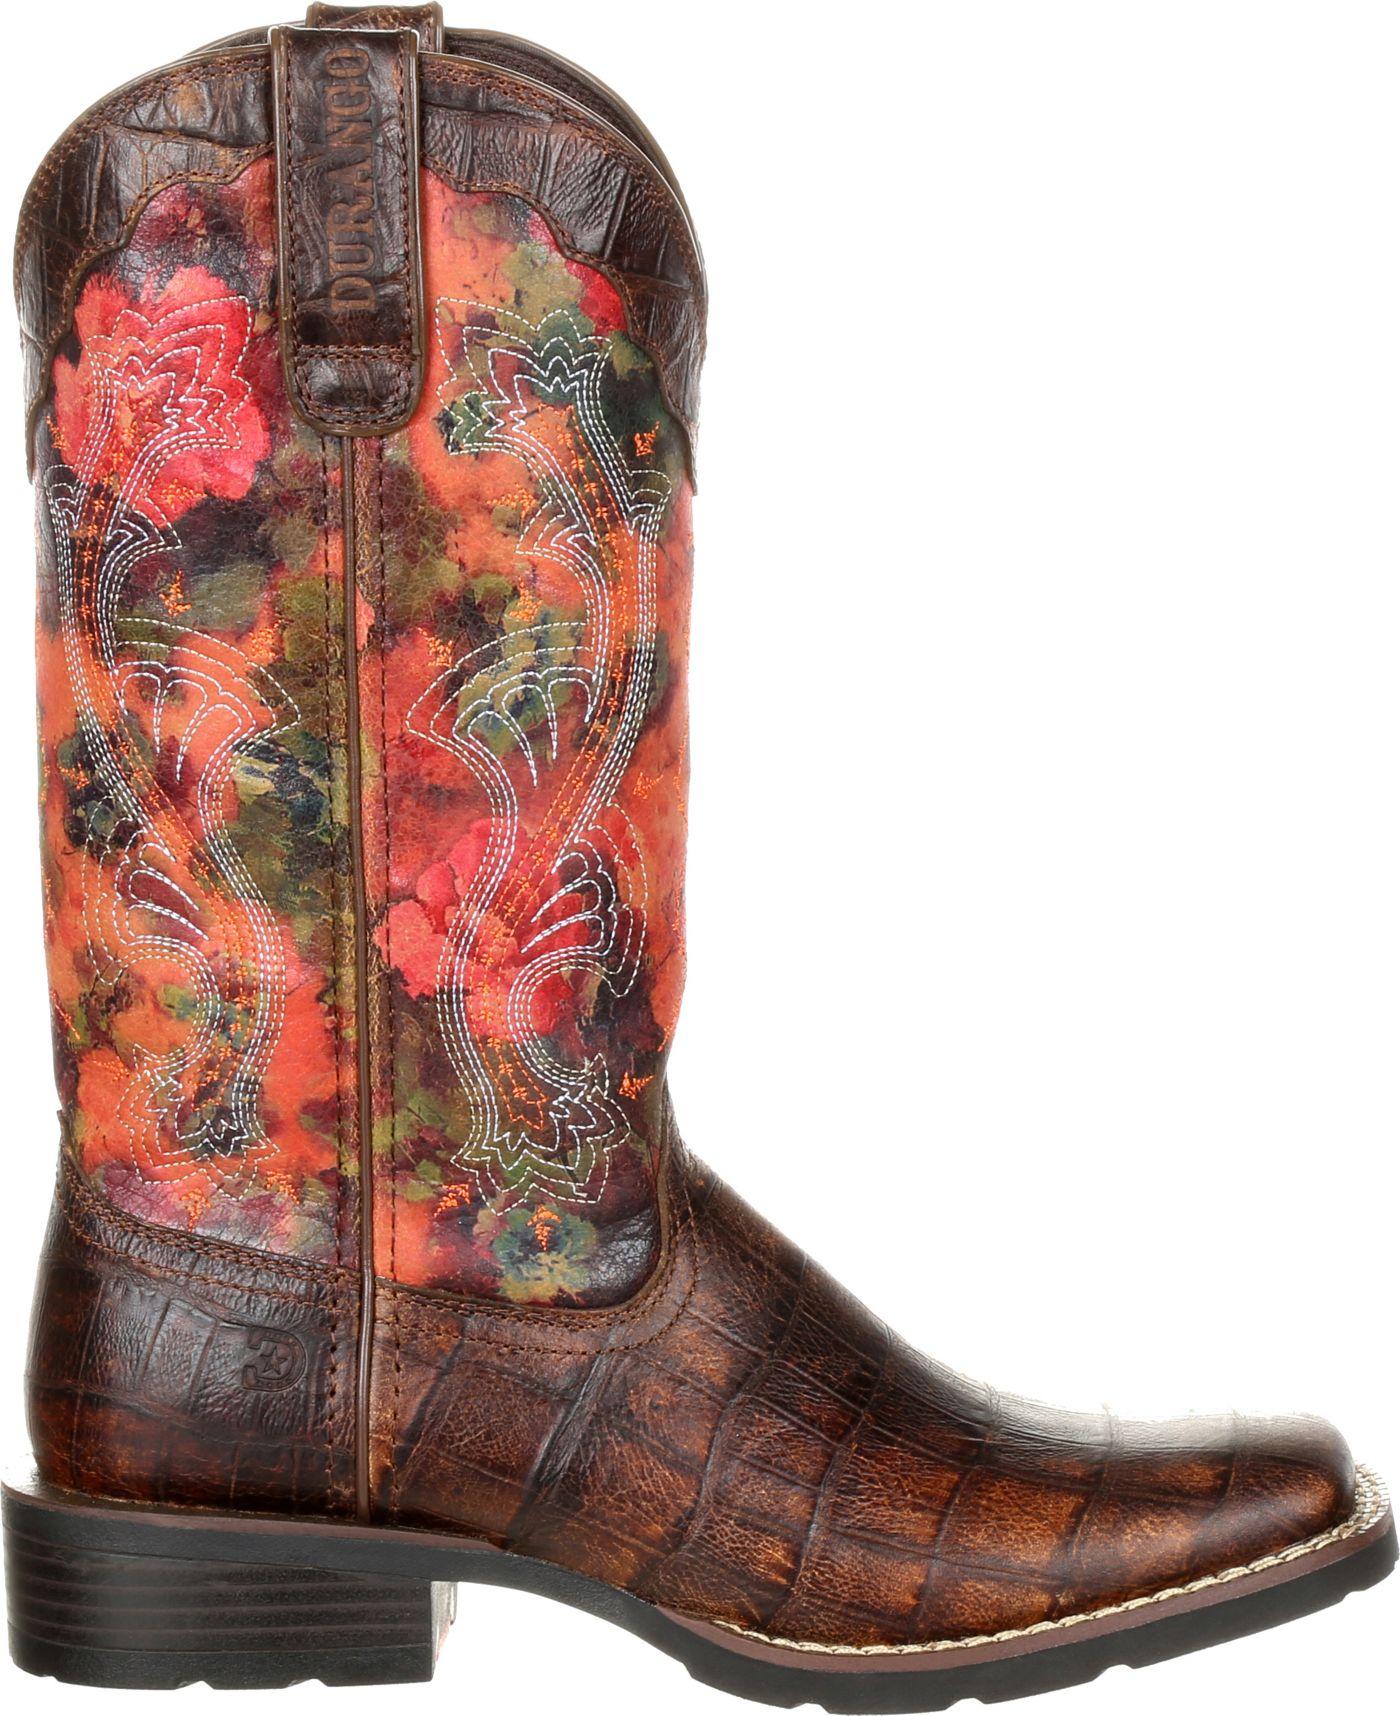 Durango Women's Mustang Exotic Rose Western Boots